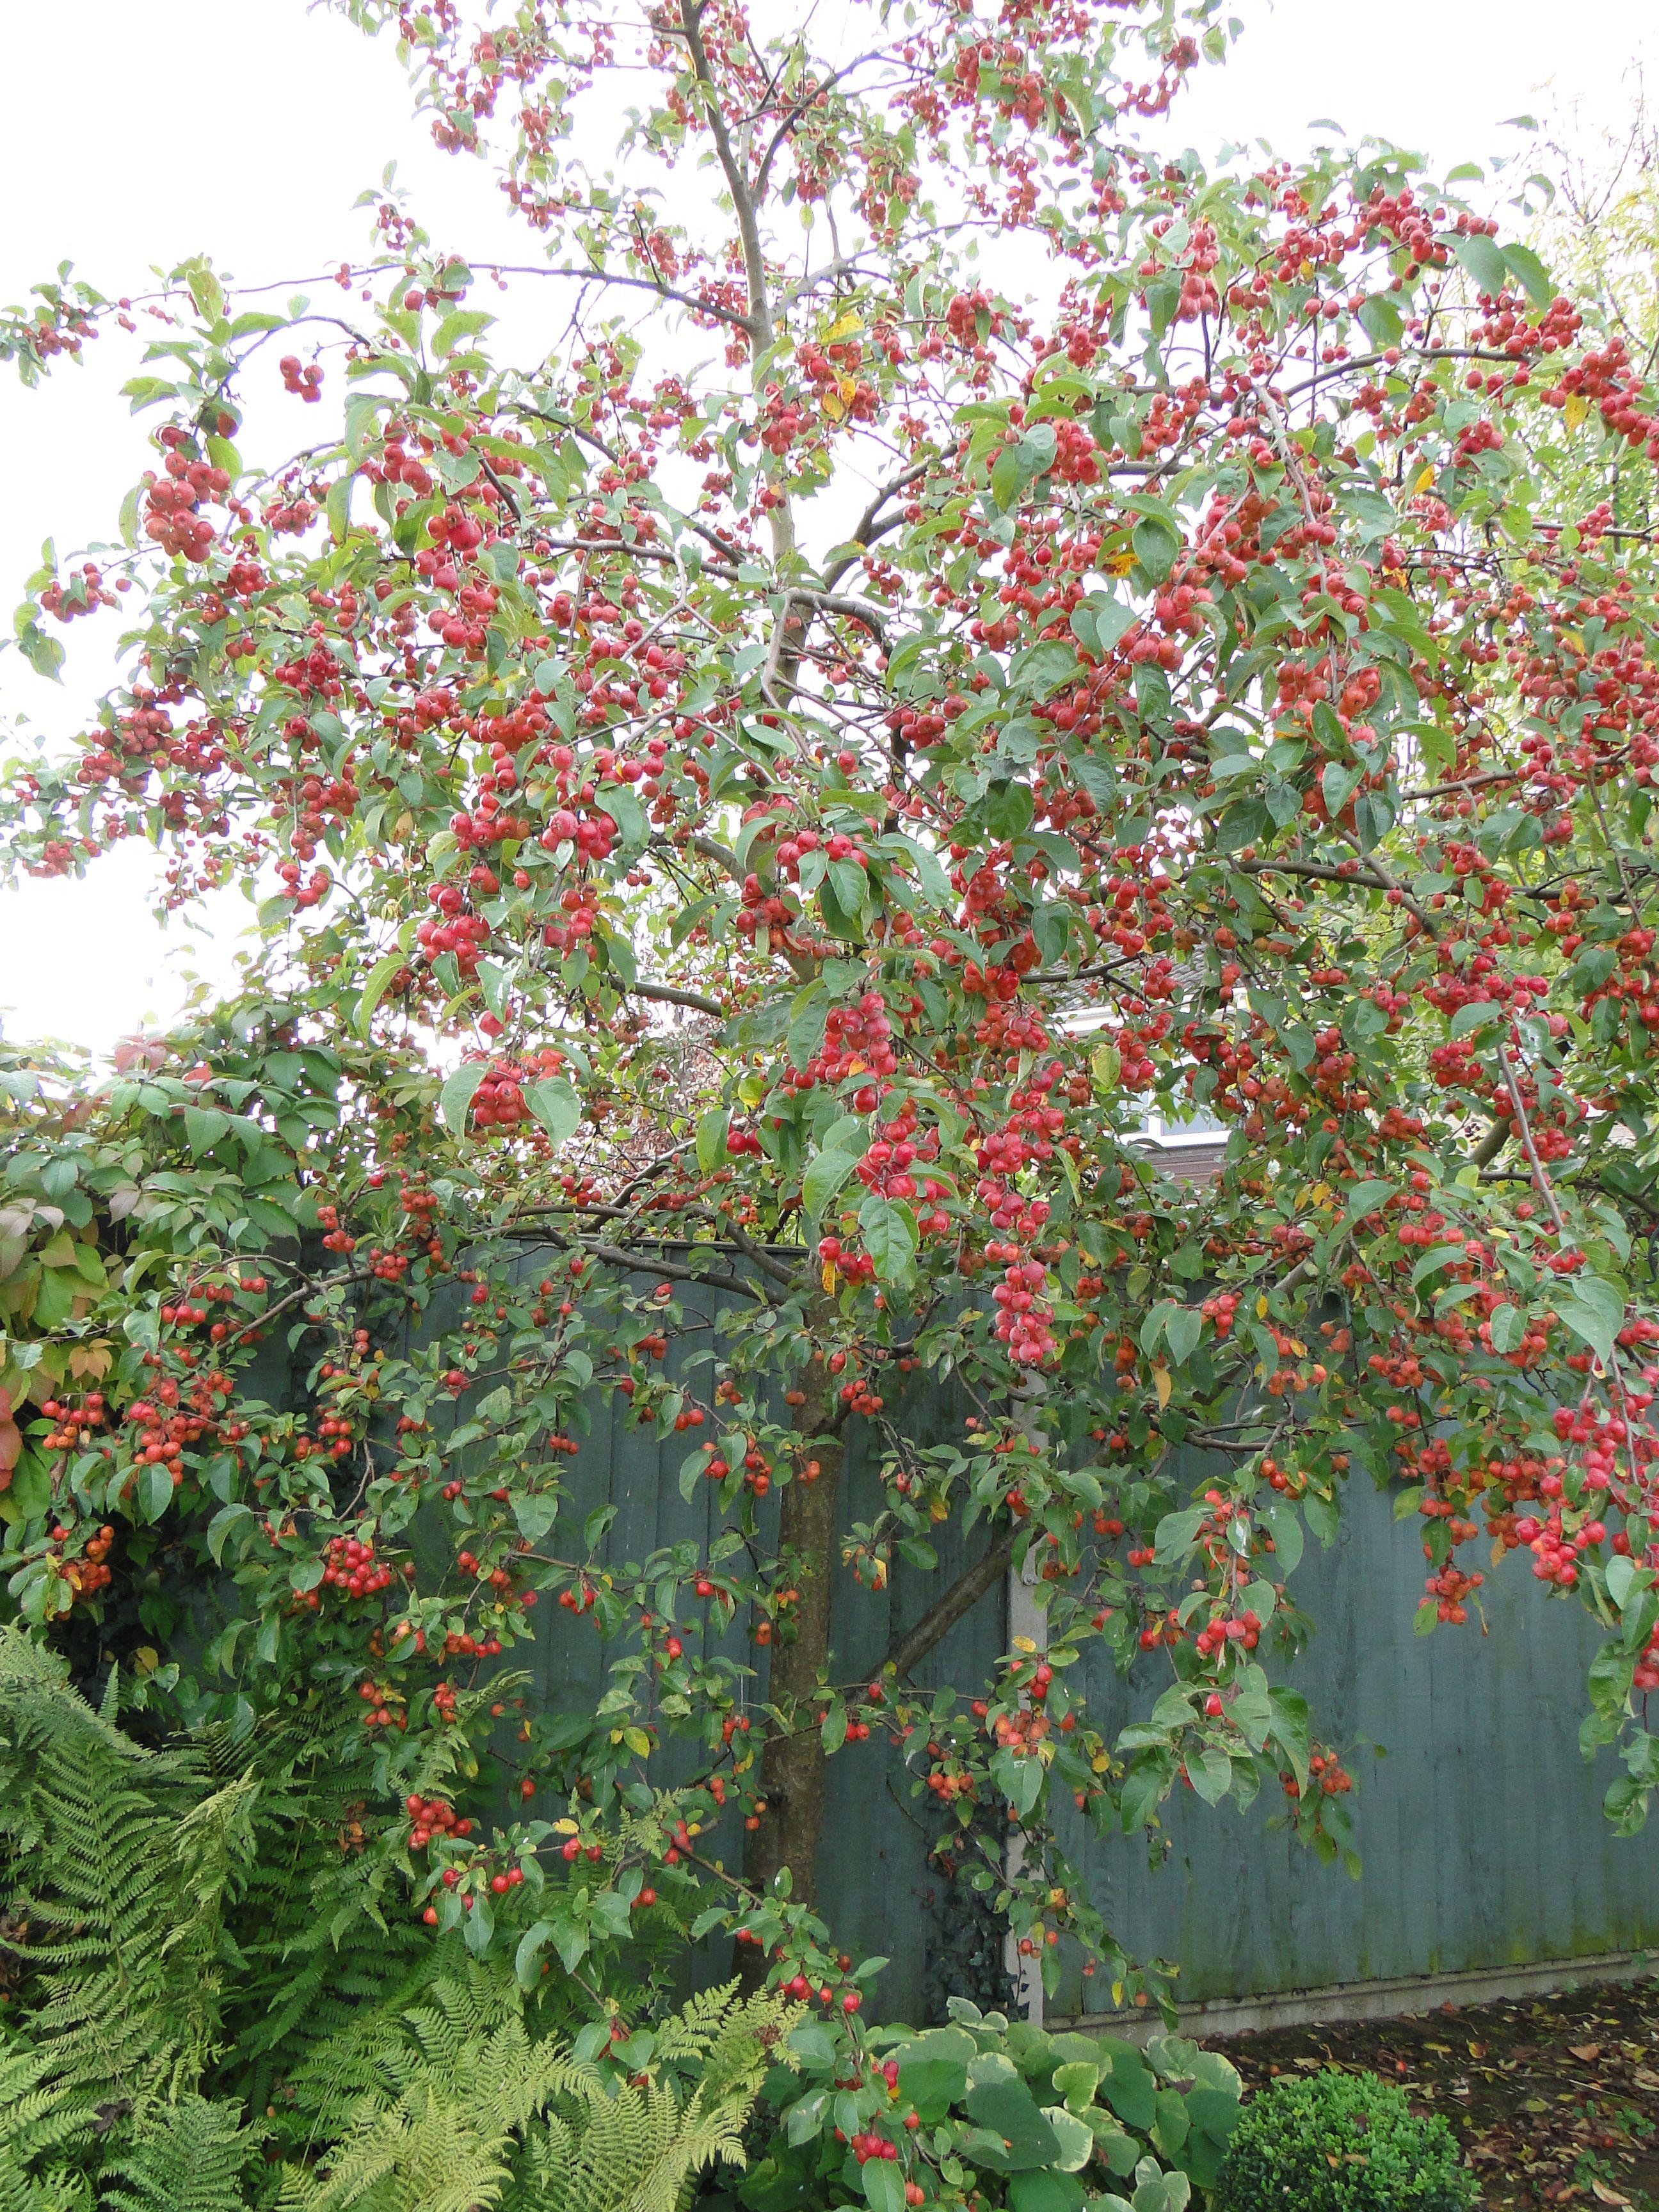 The Year of the Tree - My Crab Apple | Big garden, Garden ...